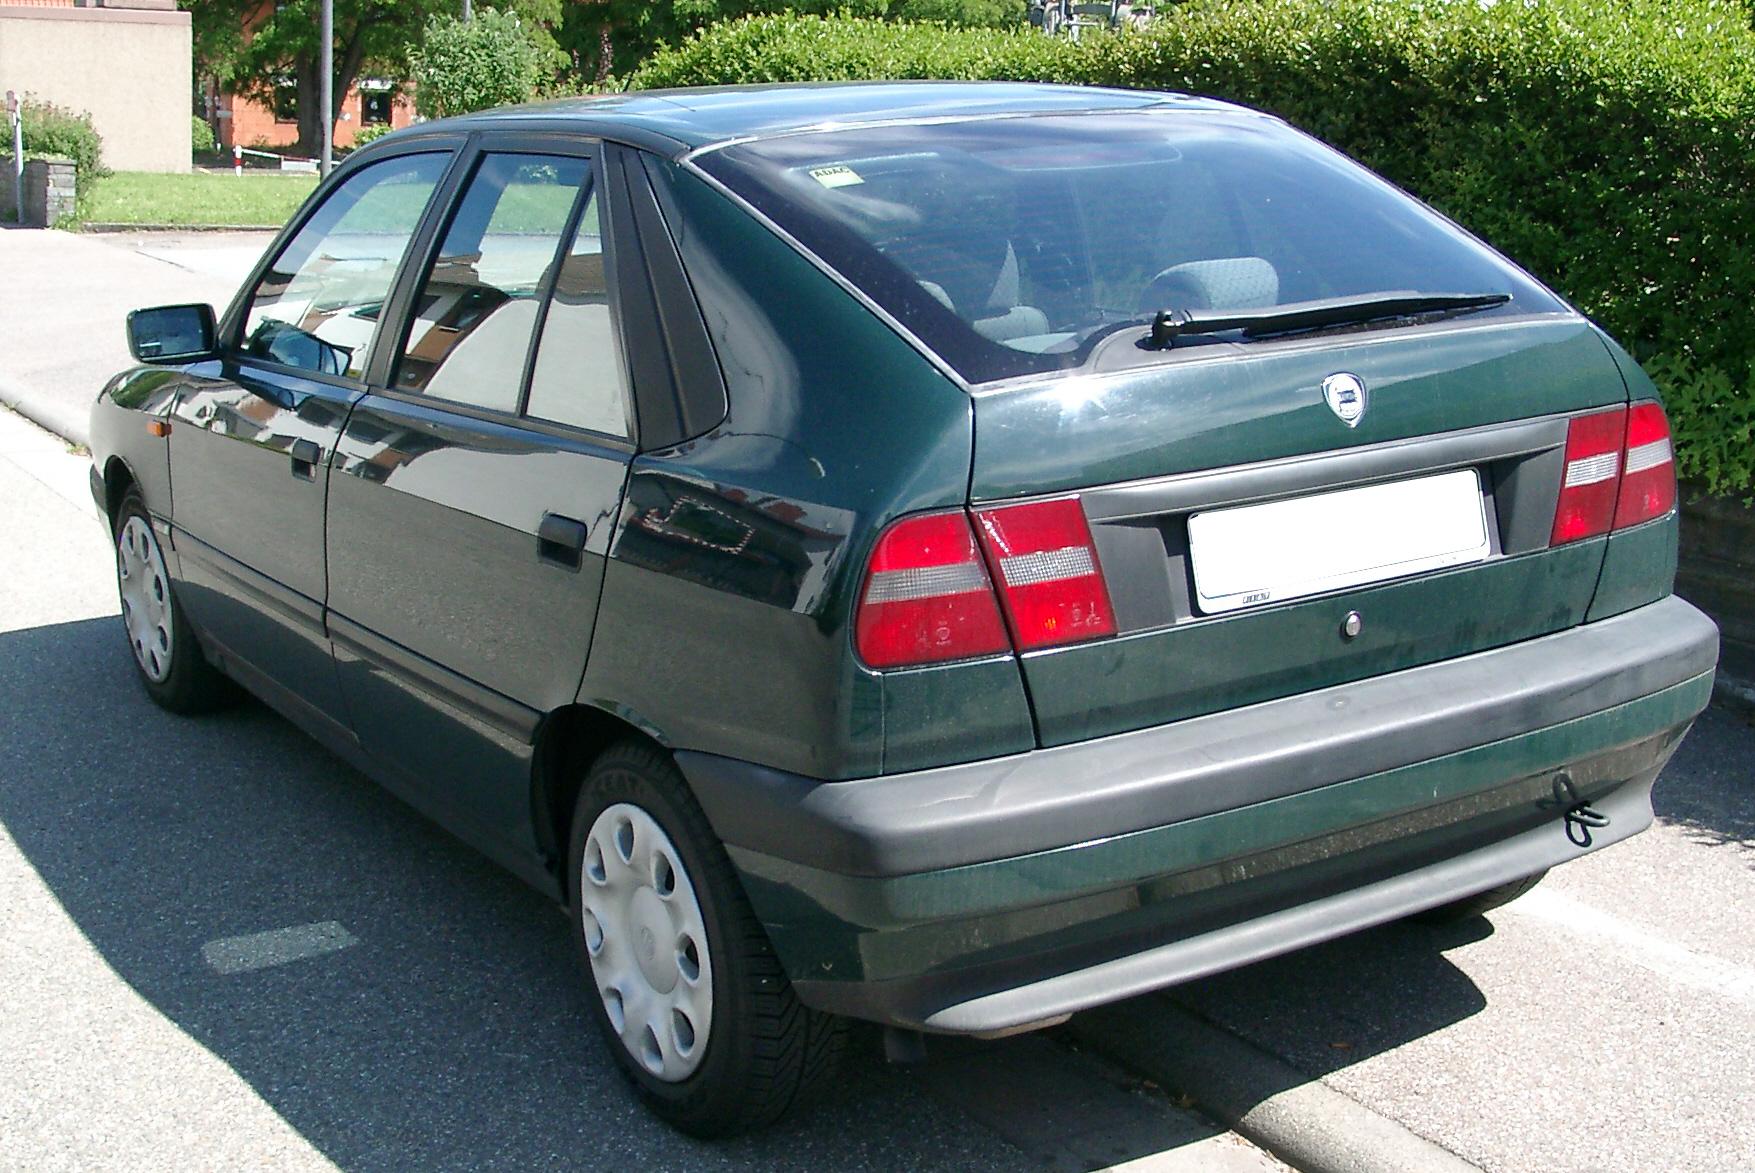 https://upload.wikimedia.org/wikipedia/commons/1/1c/Lancia_Delta_rear_20070520.jpg